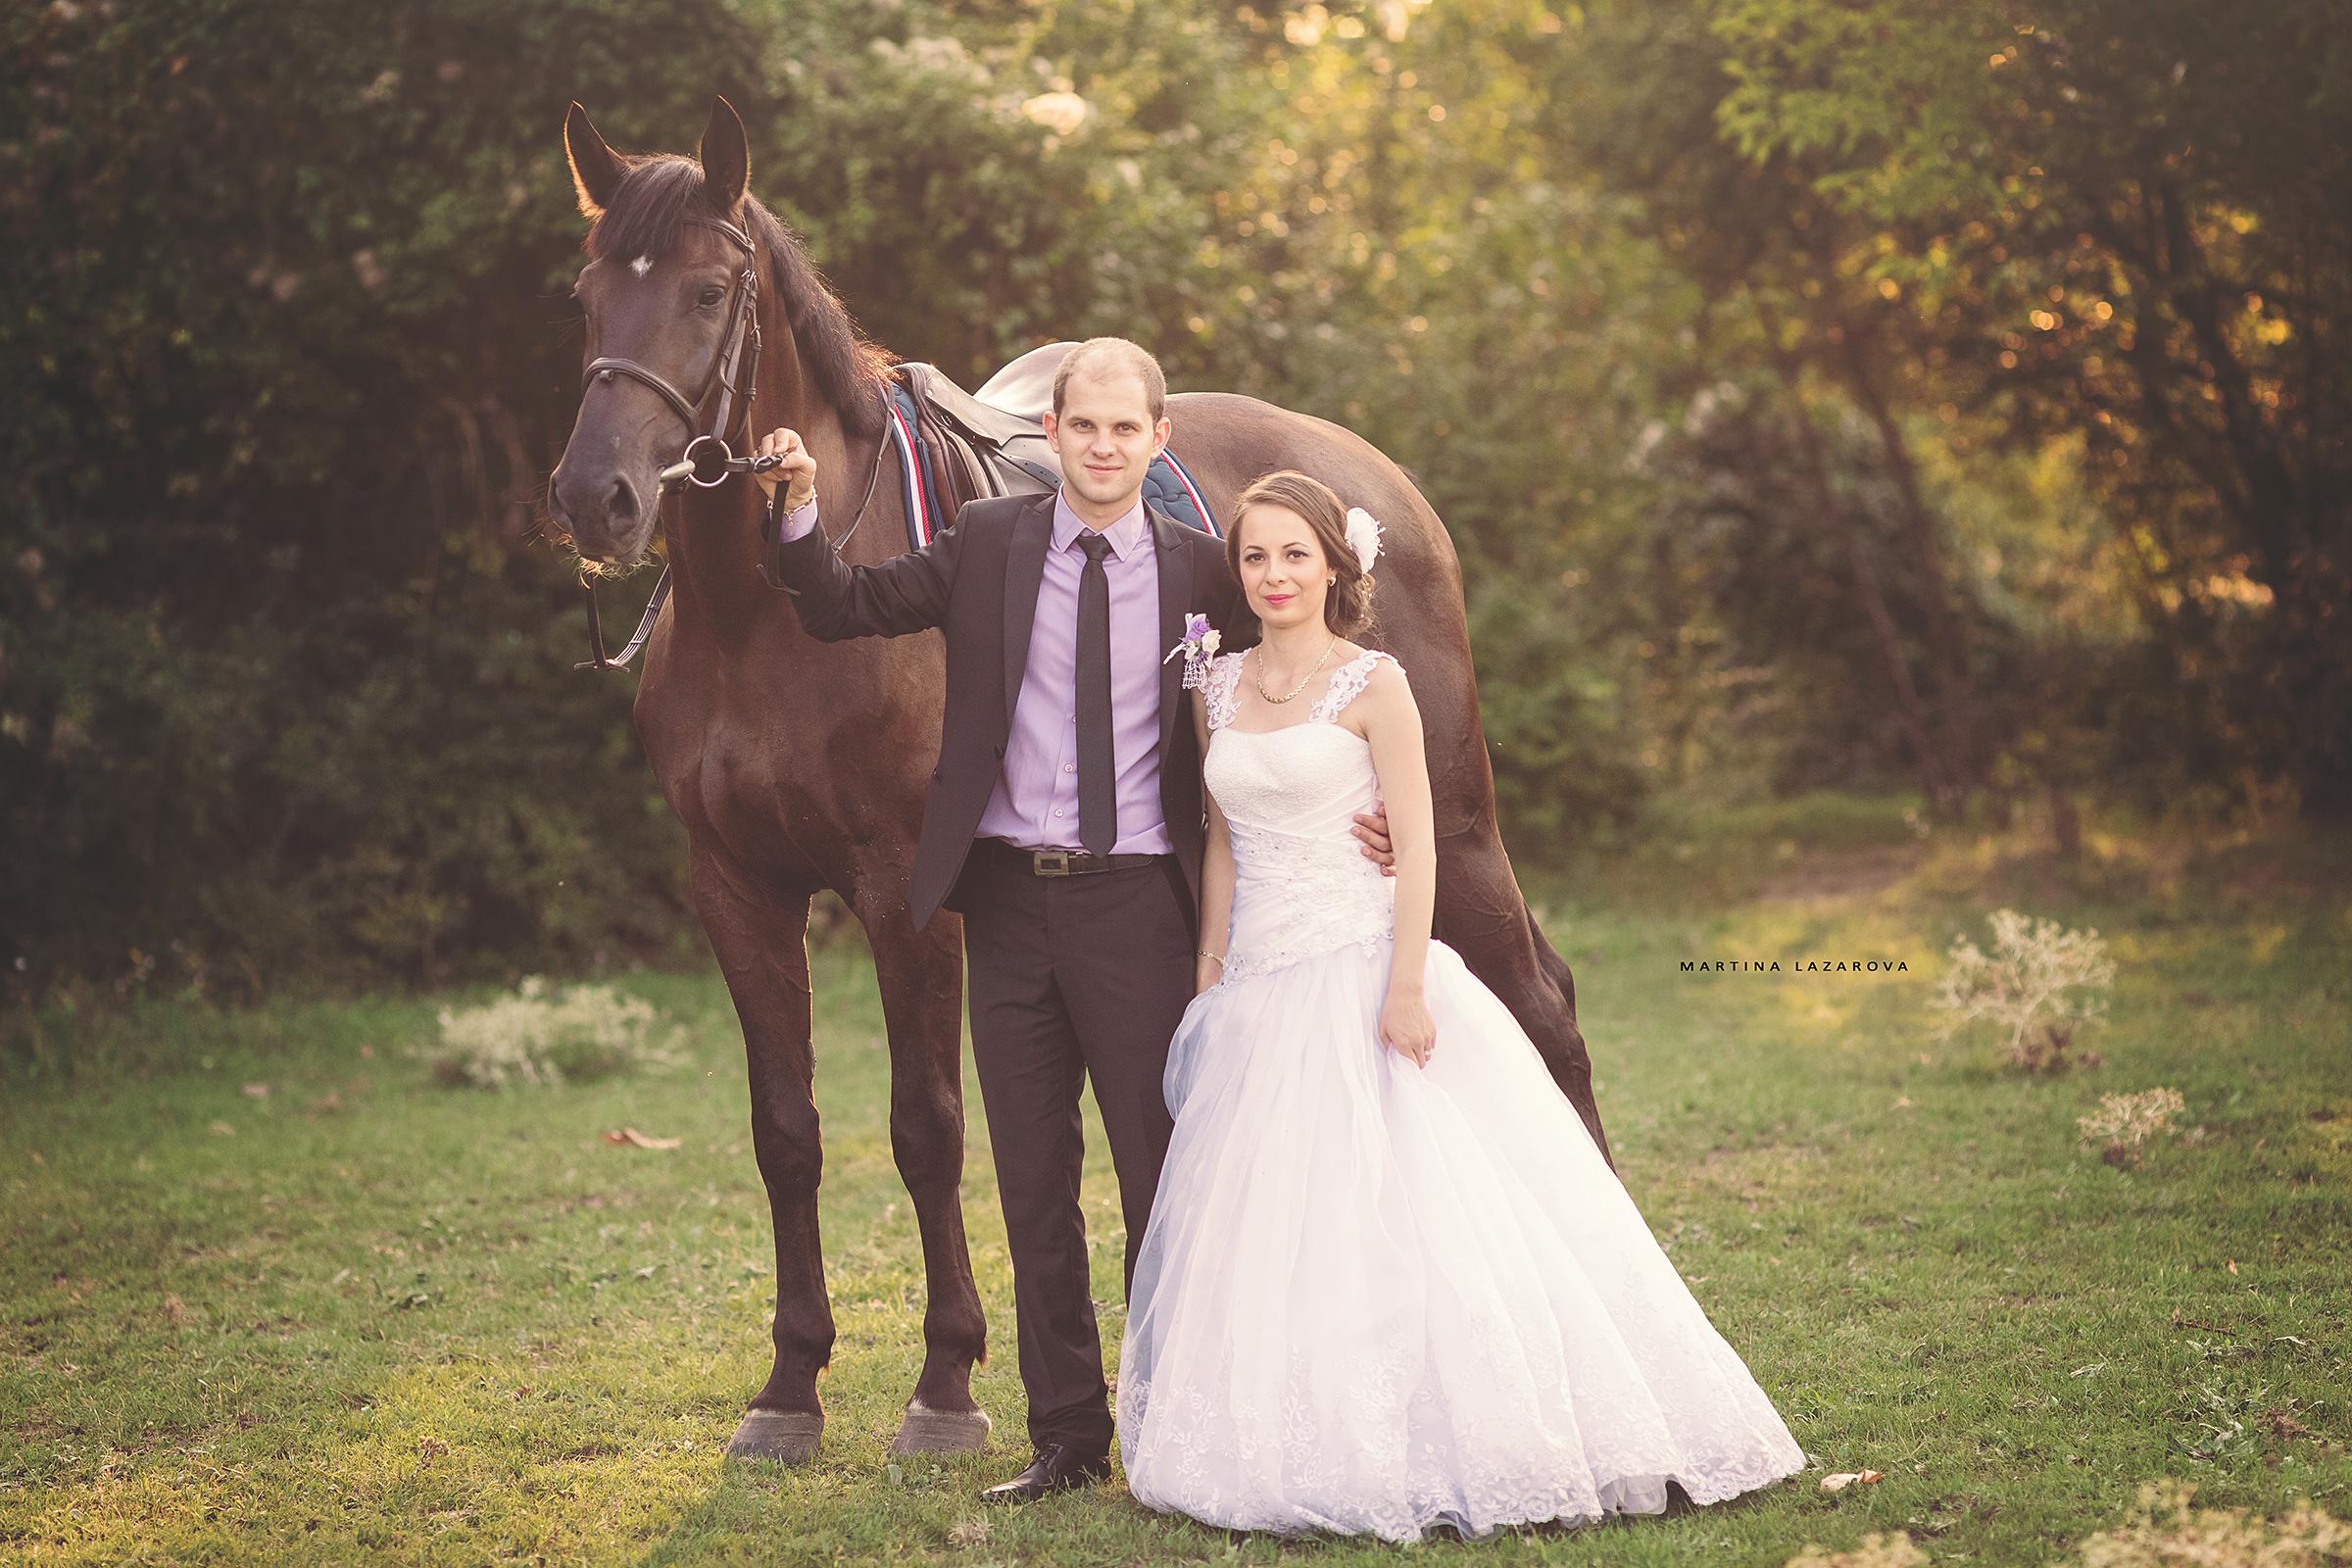 Wedding-PhotoShoot-A&S-22